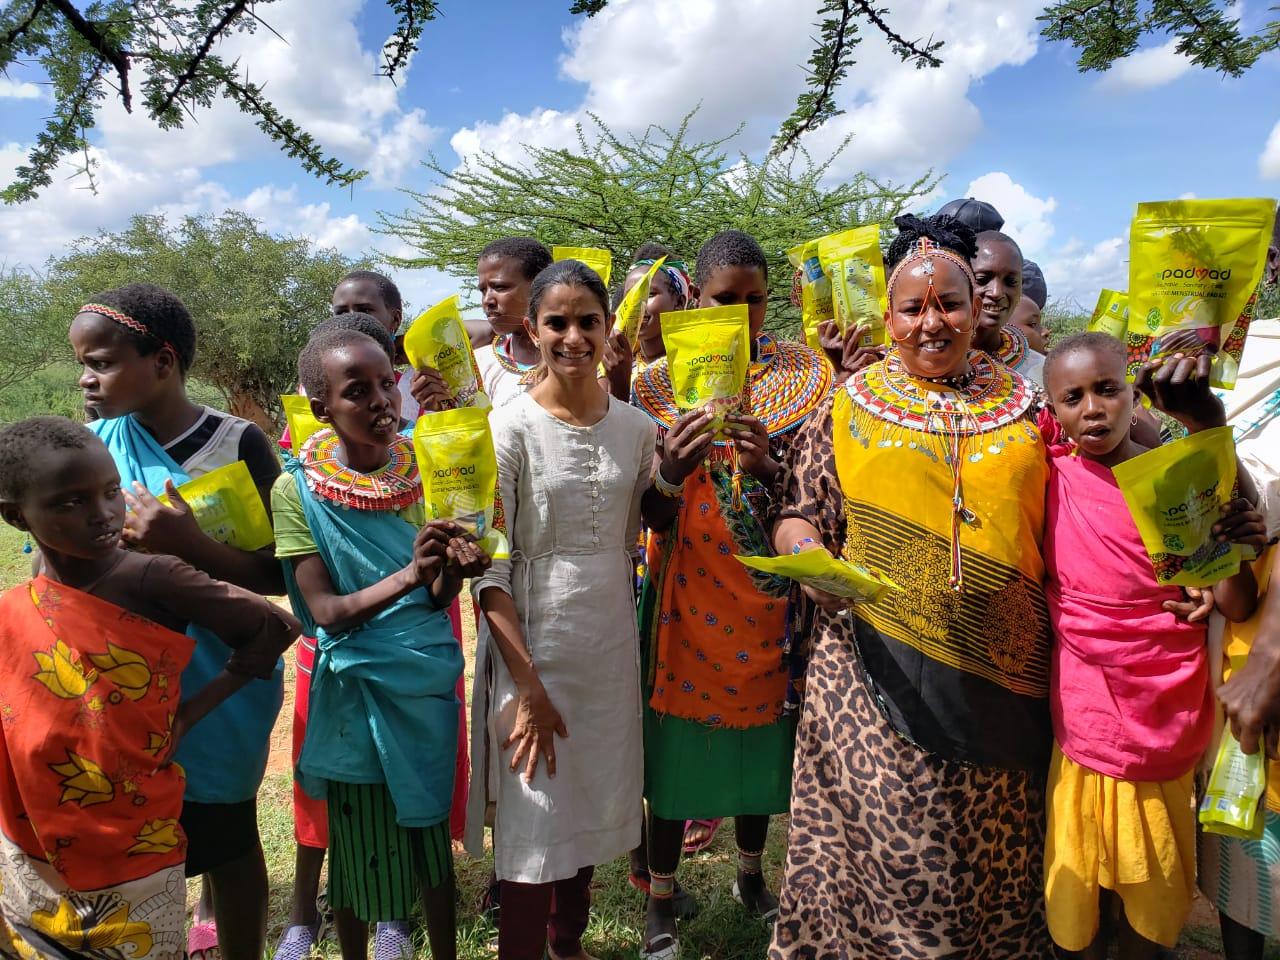 Kenya group of girls charity sanitary pads